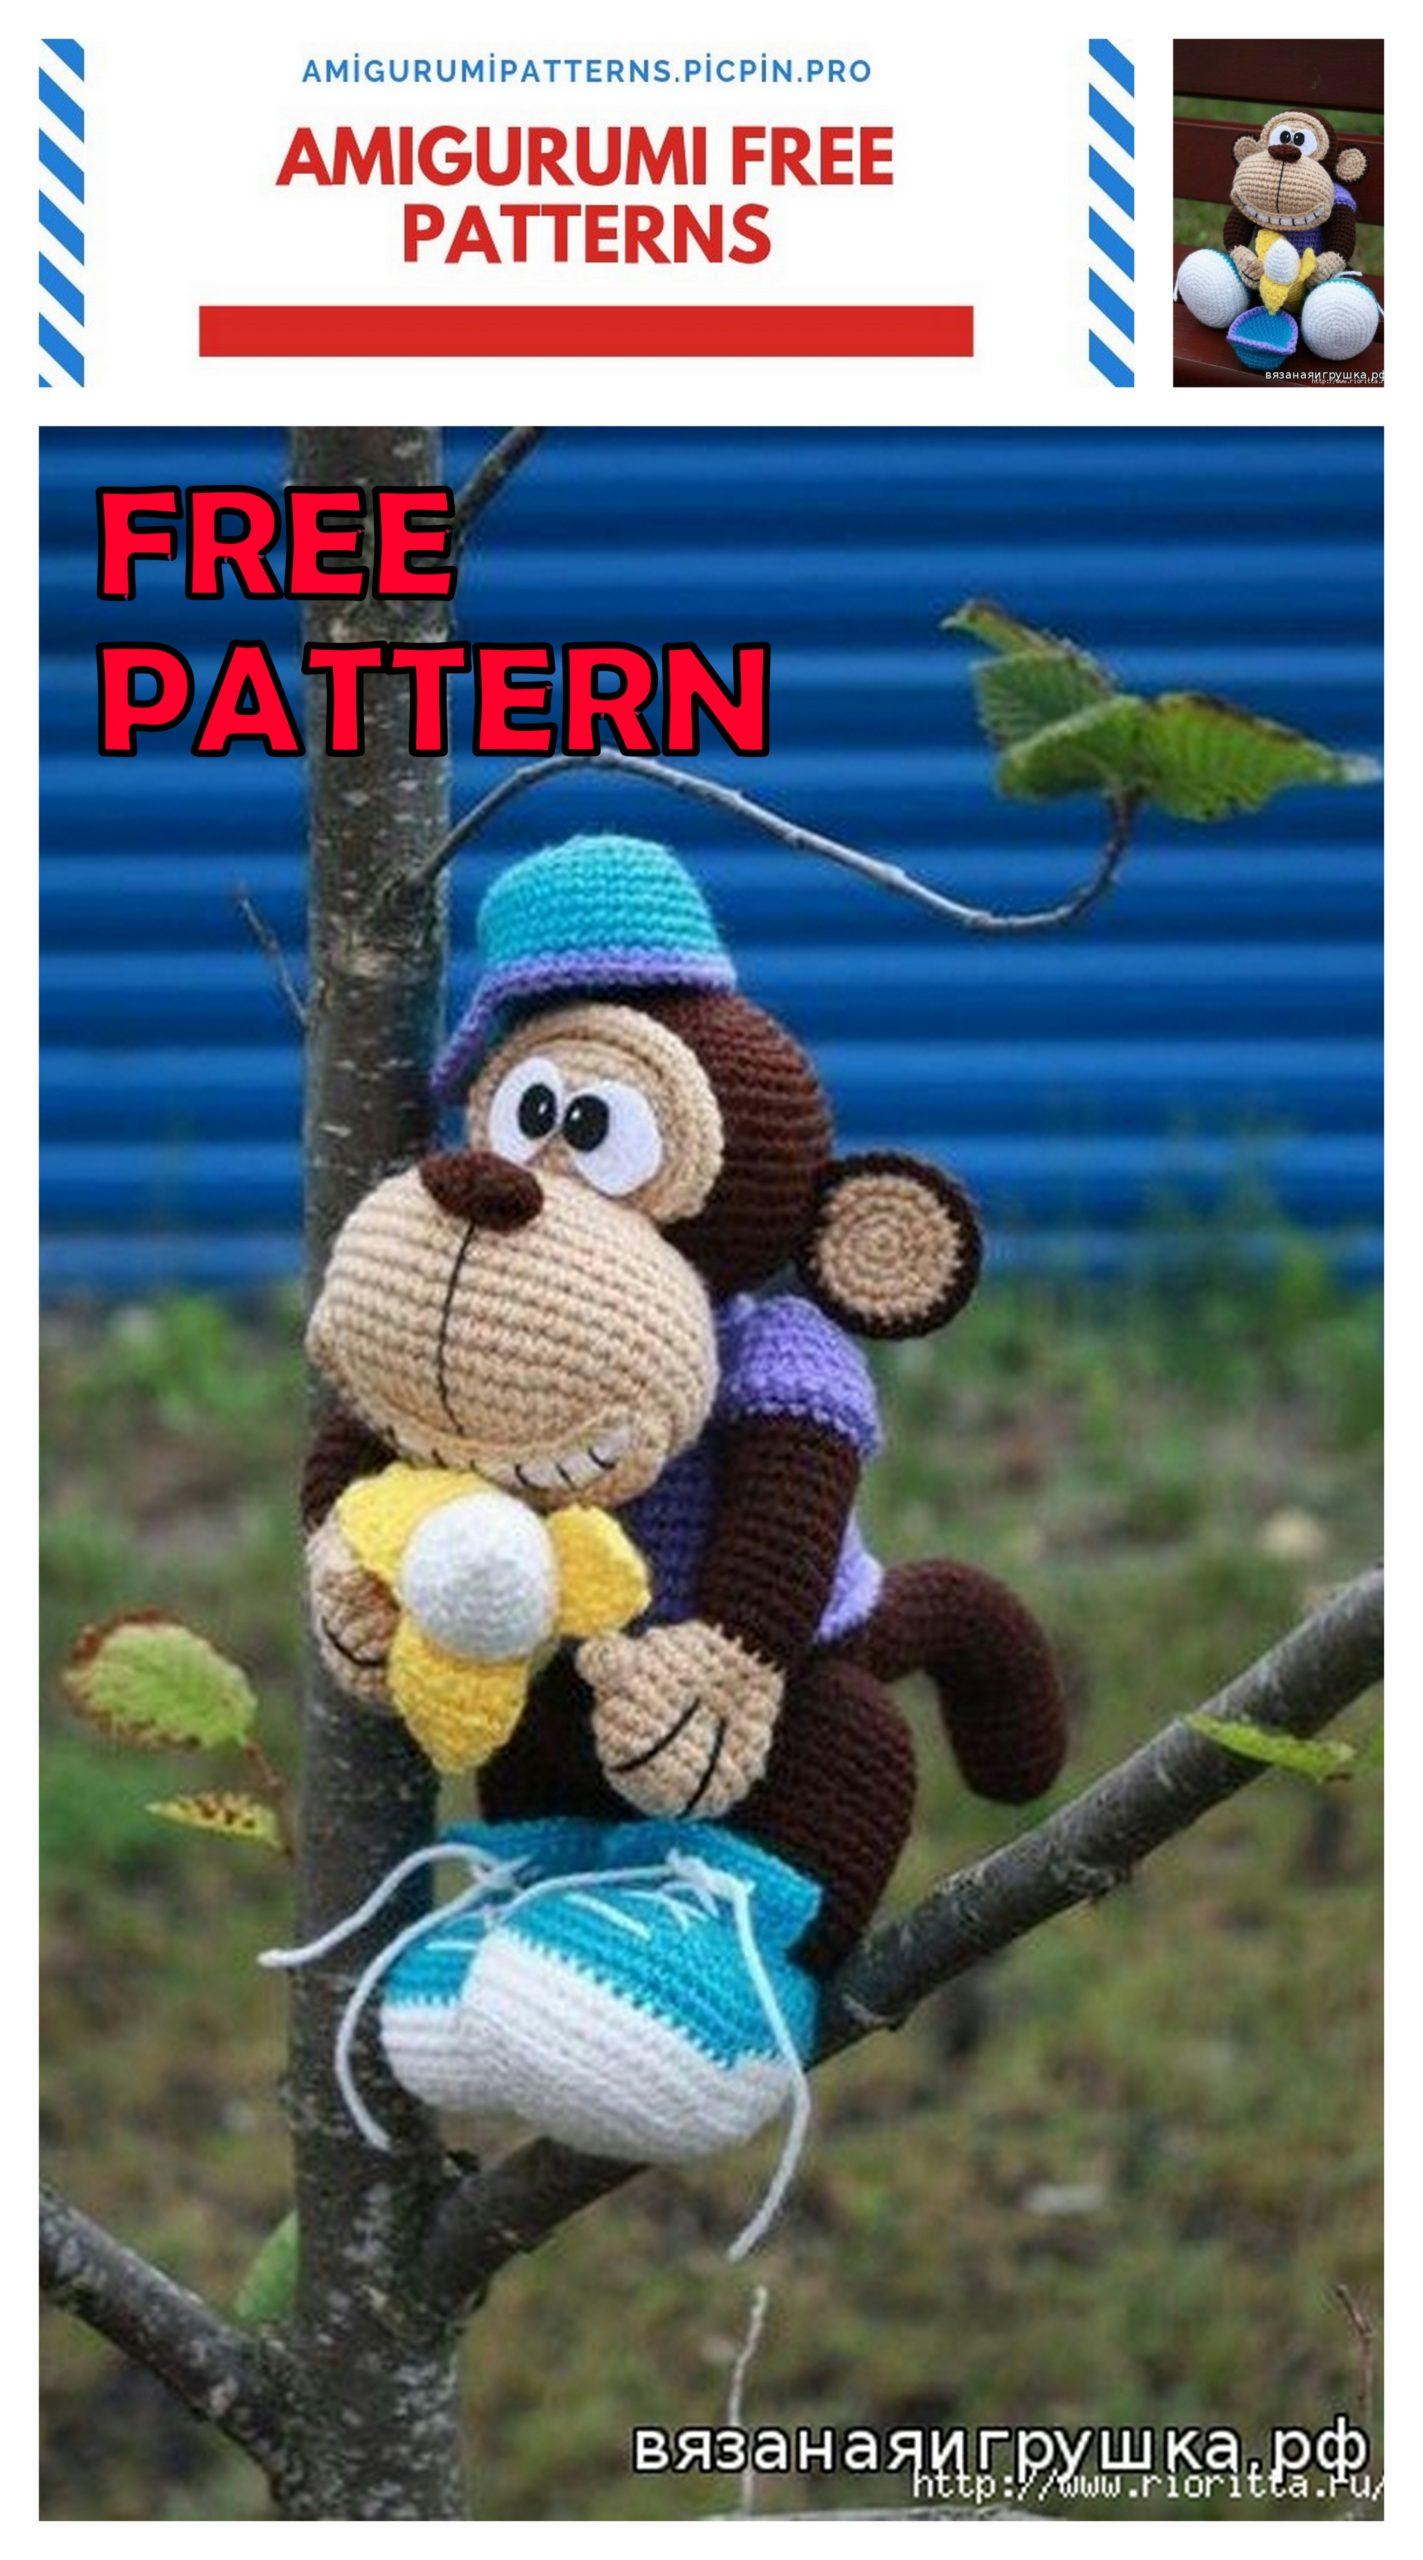 Cuddle Me Monkey amigurumi pattern - Amigurumi Today   2560x1423